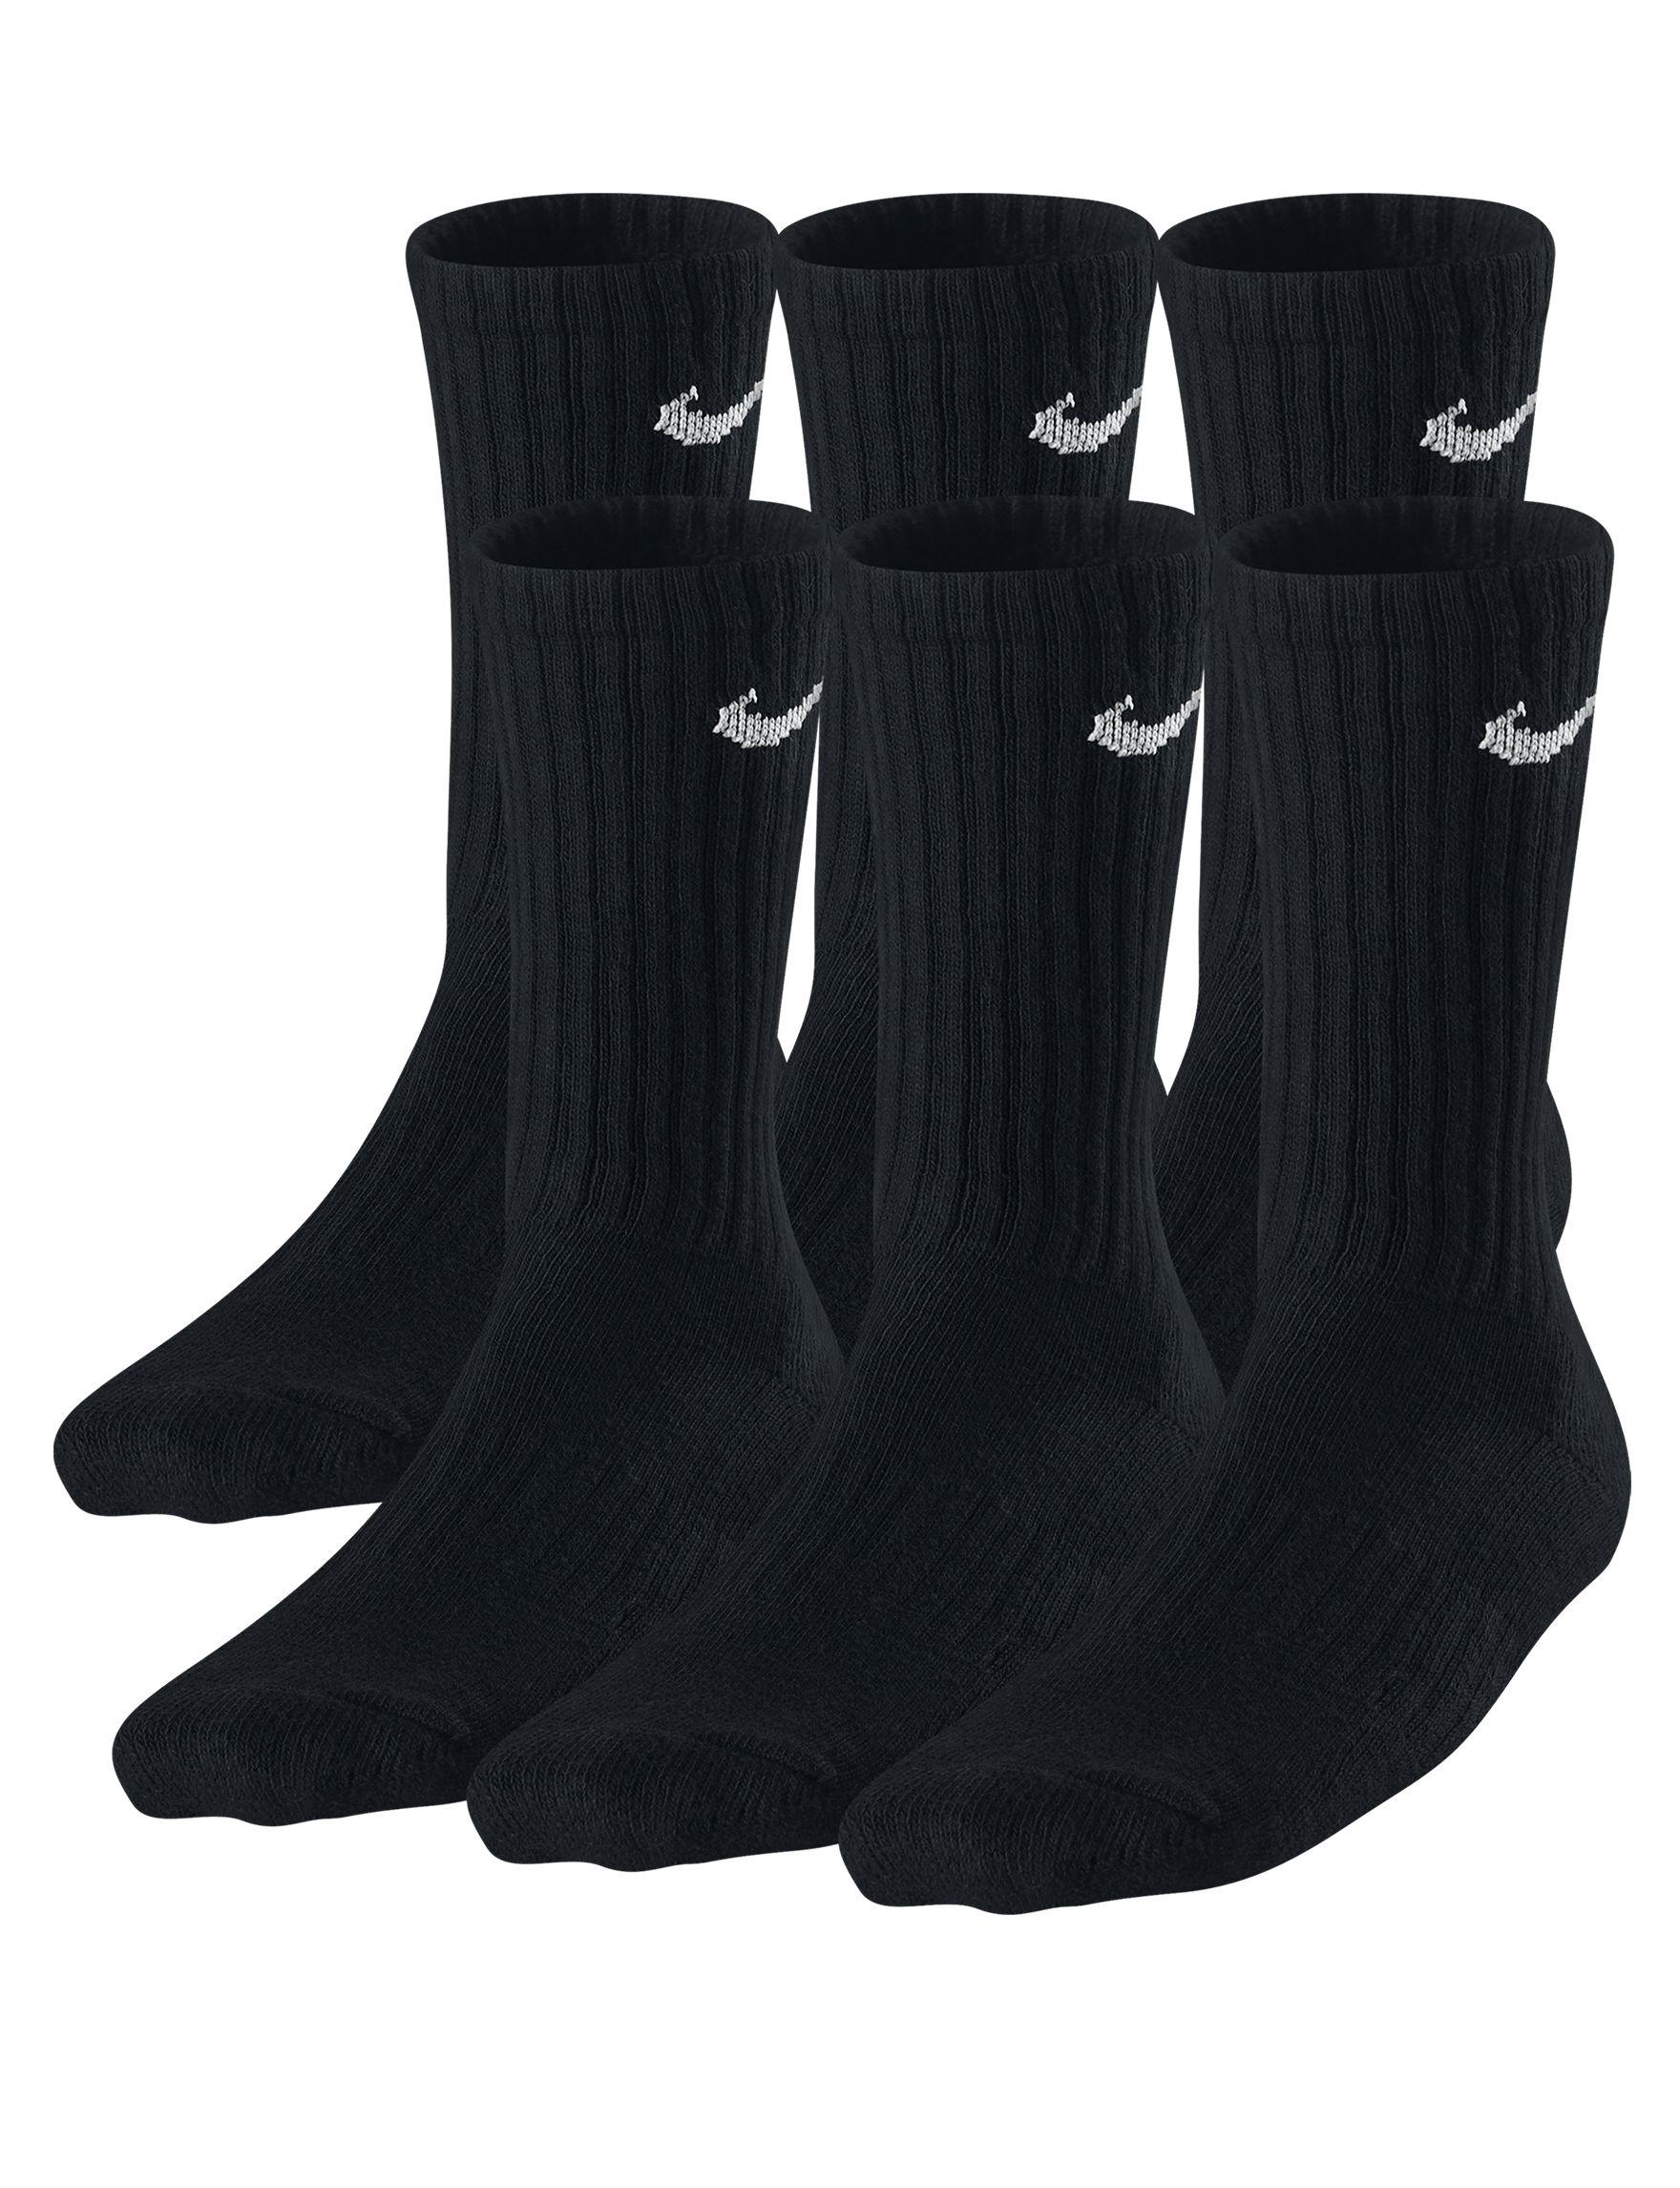 Nike Black Socks